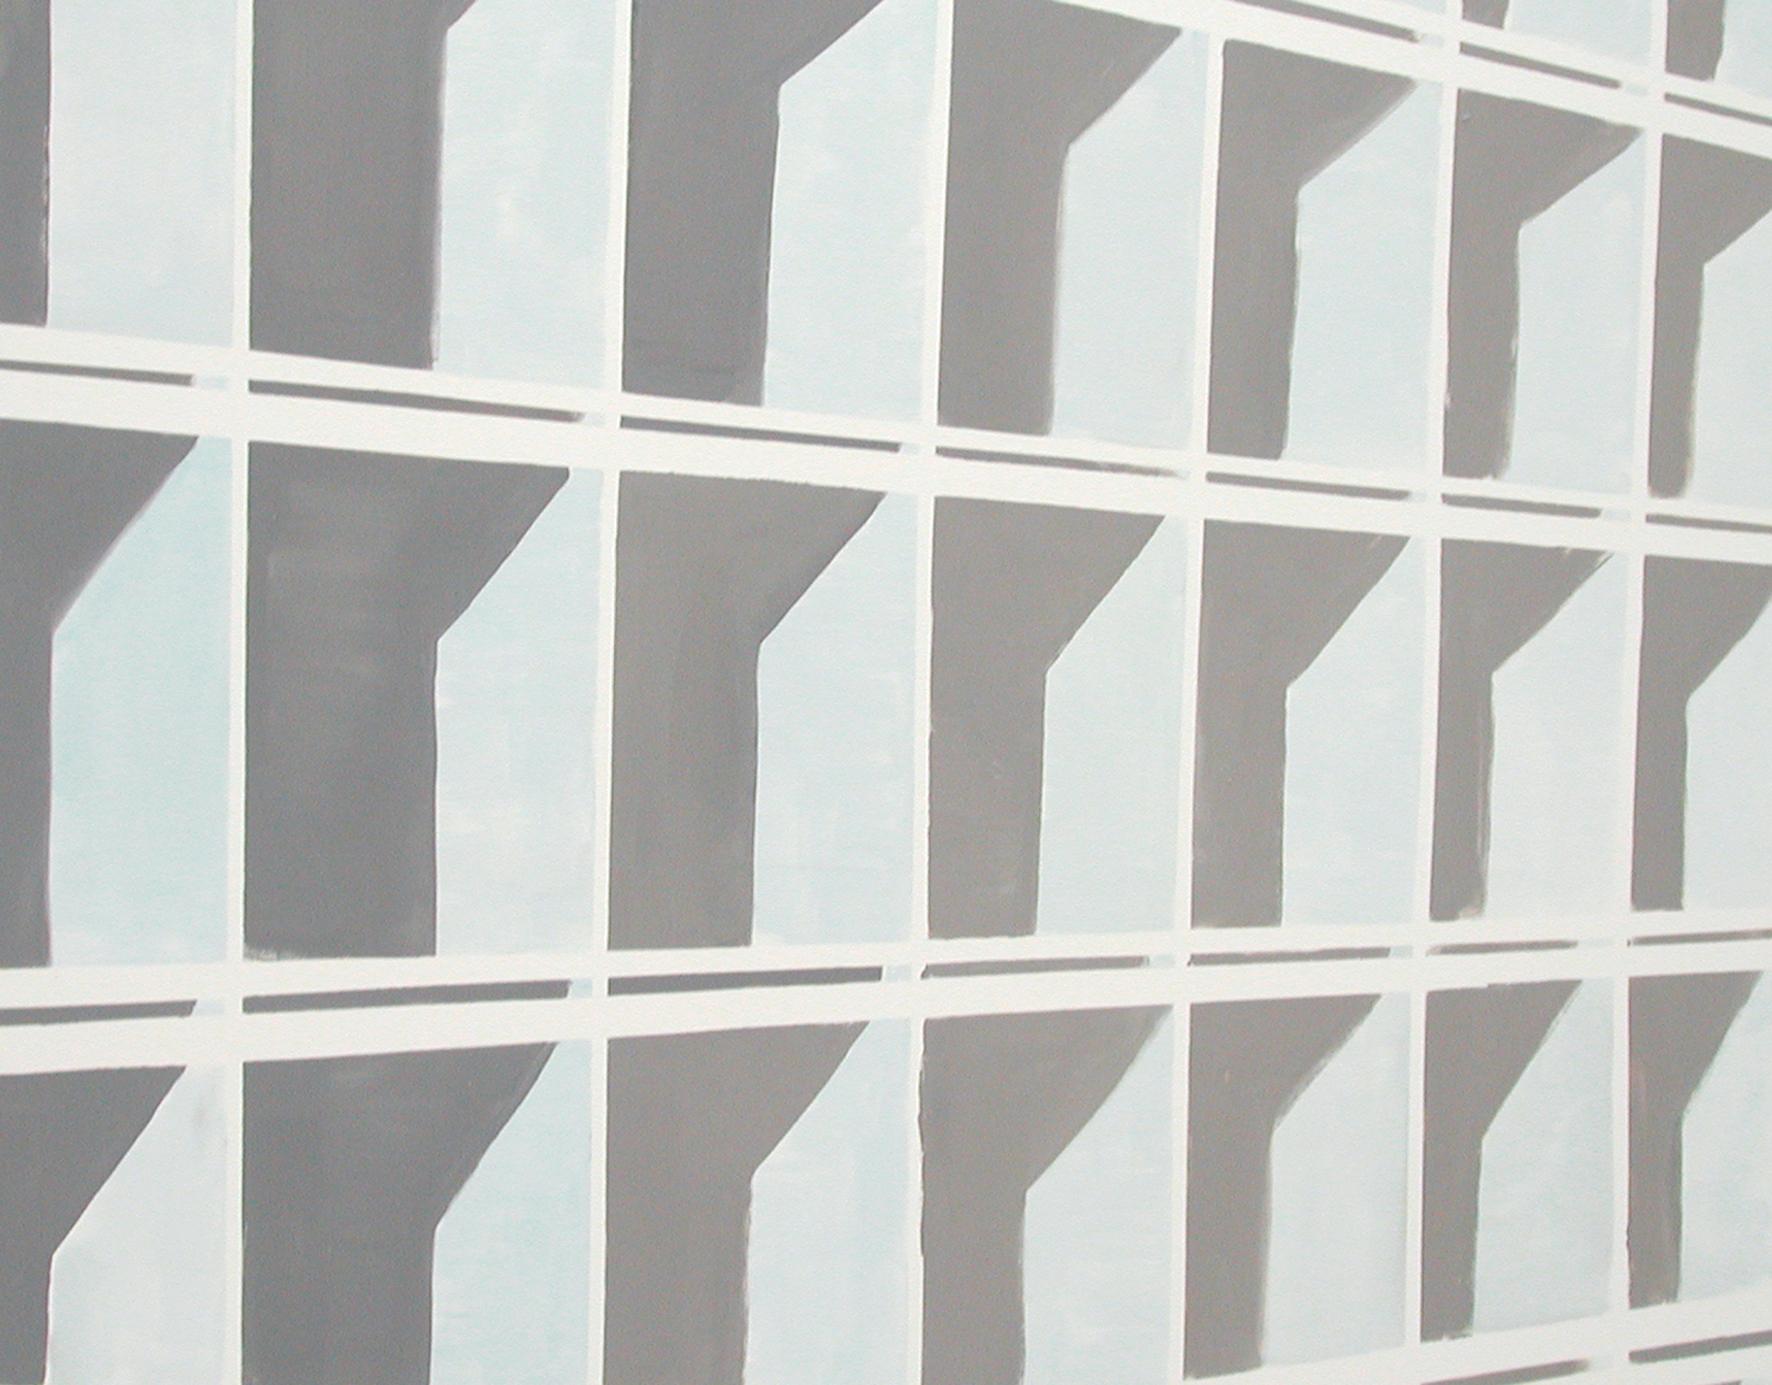 la fassade kopie 1 kotscha reist. Black Bedroom Furniture Sets. Home Design Ideas